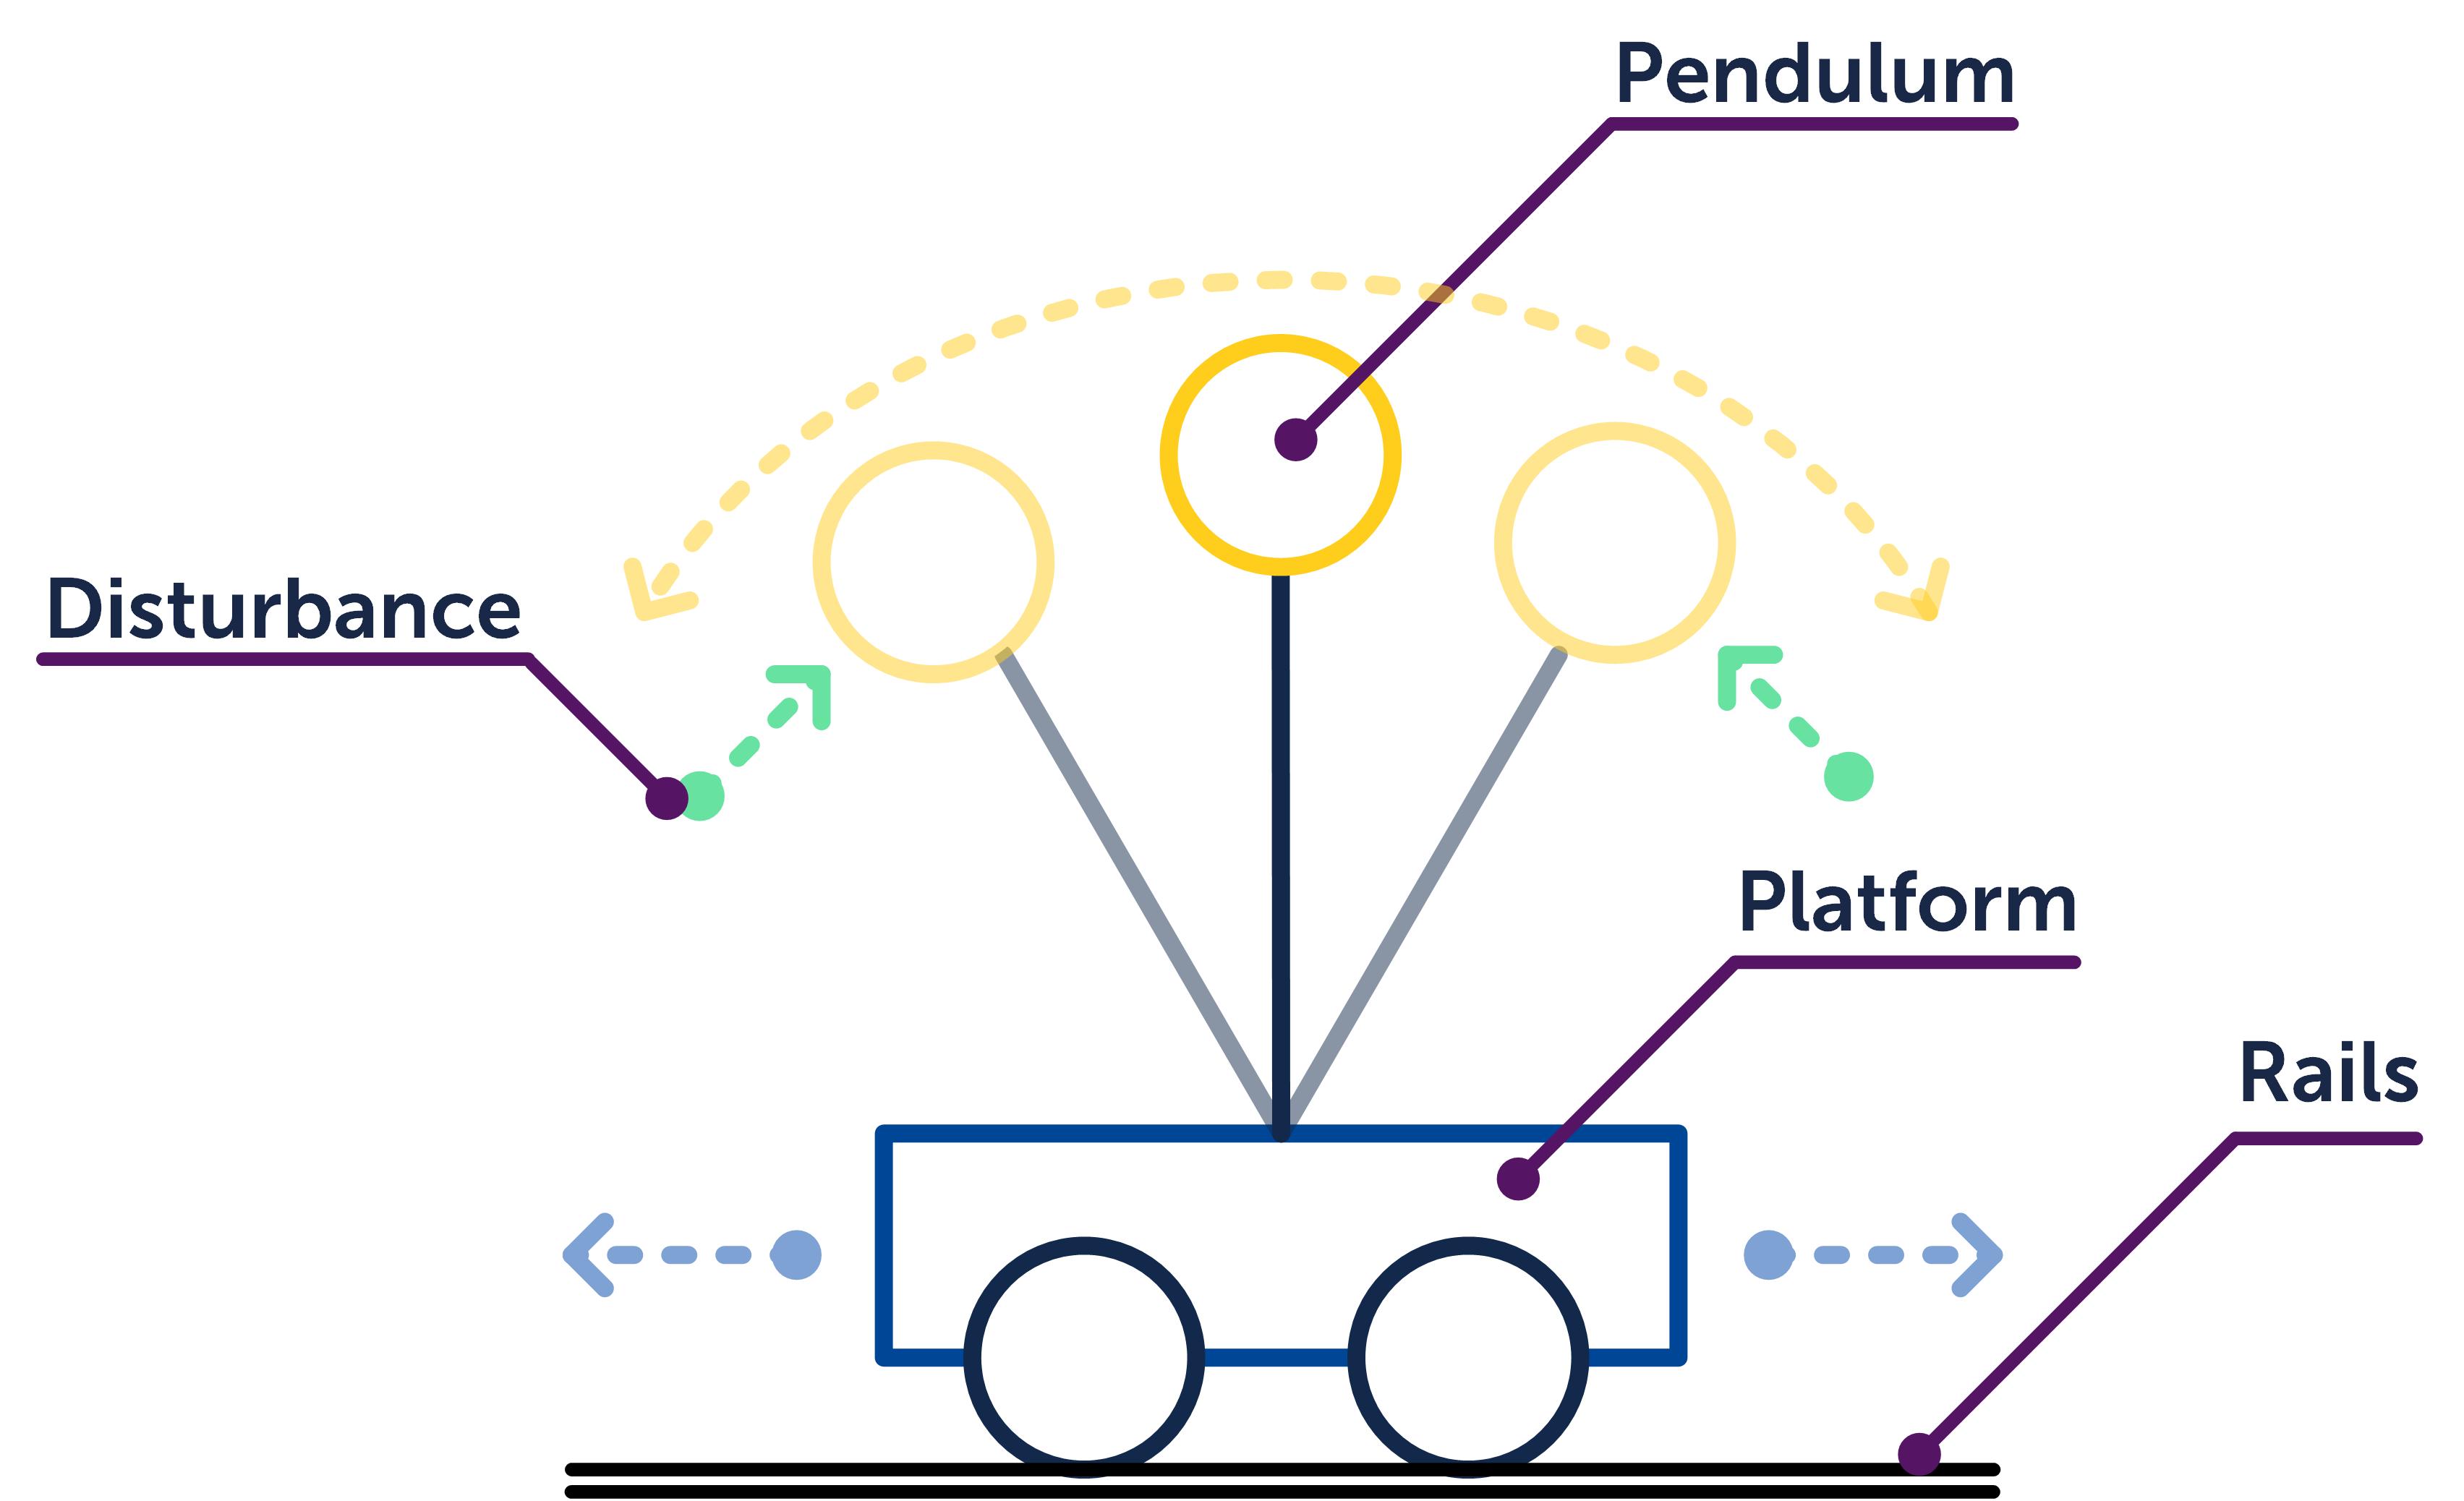 org.fortiss.af3.rcp.help/html/gettingStarted/img/inverted-pendulum_illustration.png